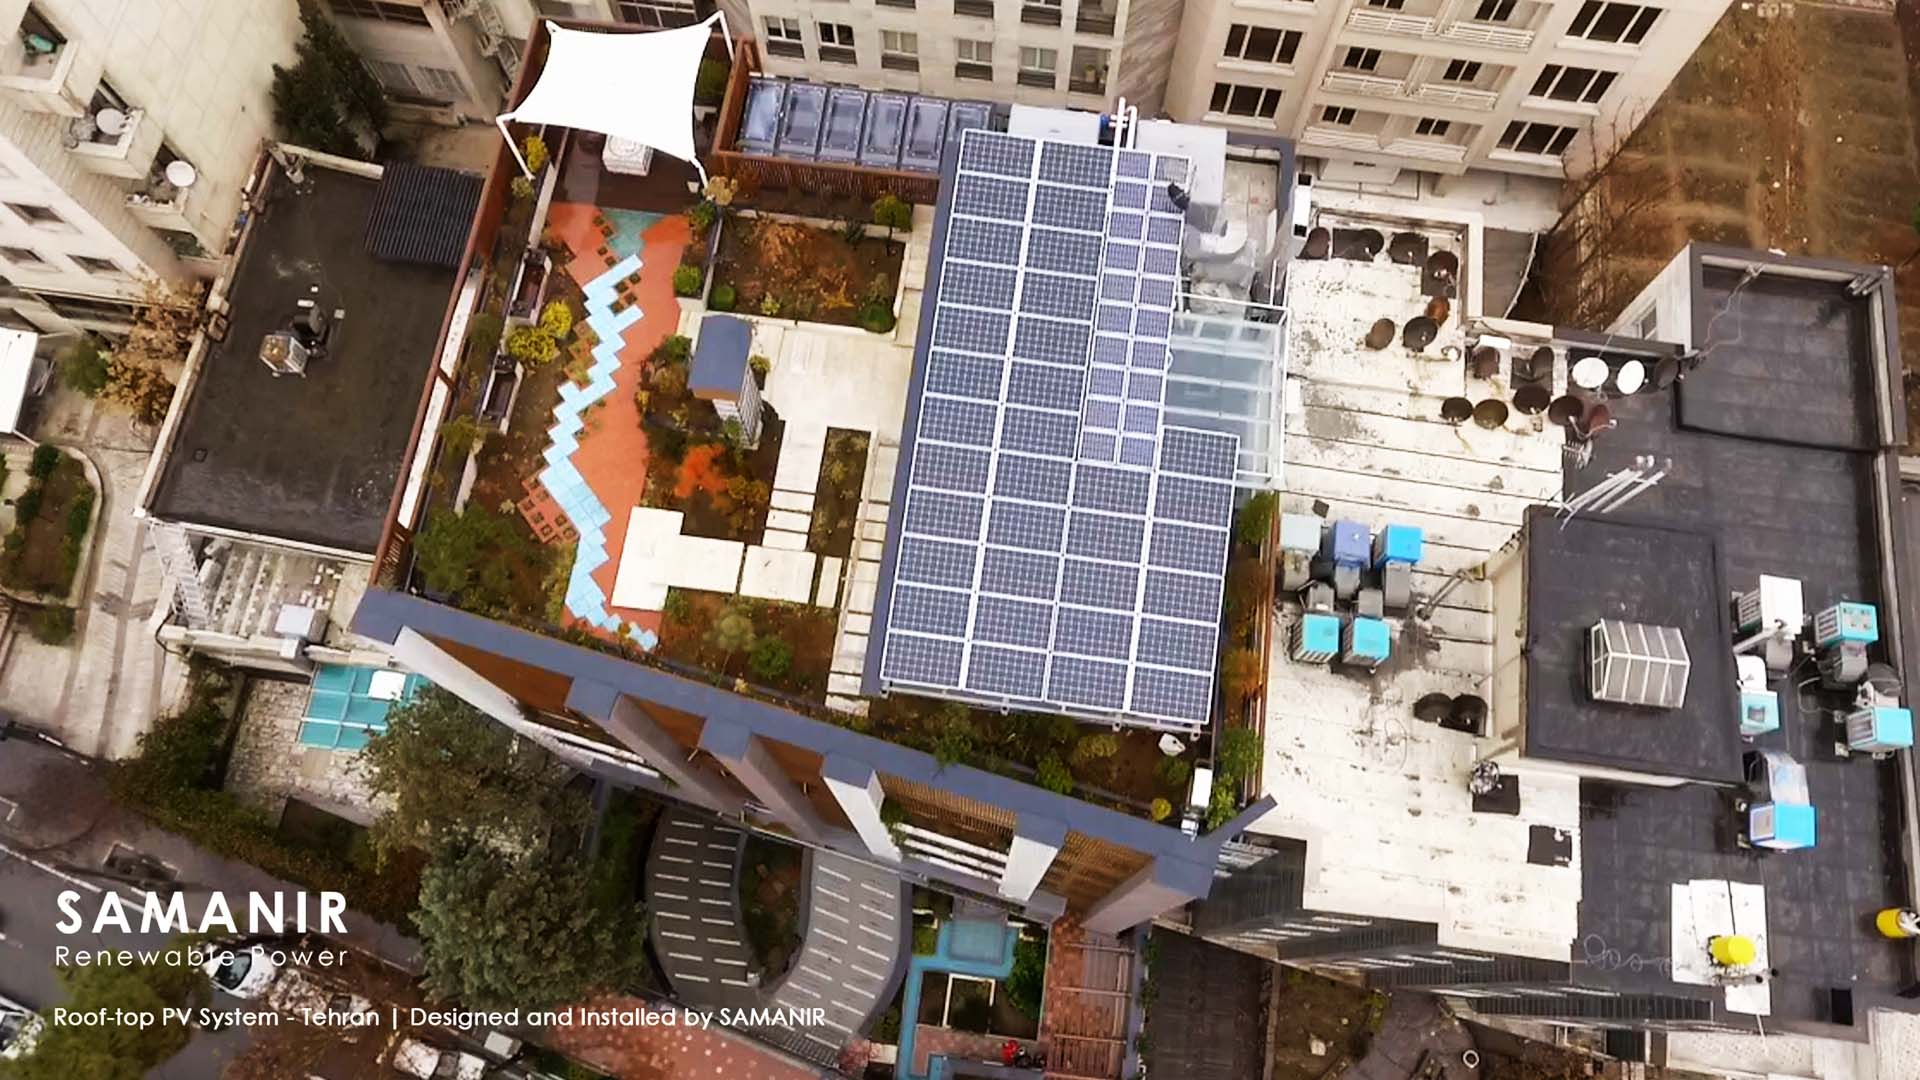 SAMANIR SOLAR ROOF-TOP PV SYSTEM نیروگاه خورشیدی ساختمانی سمانیر